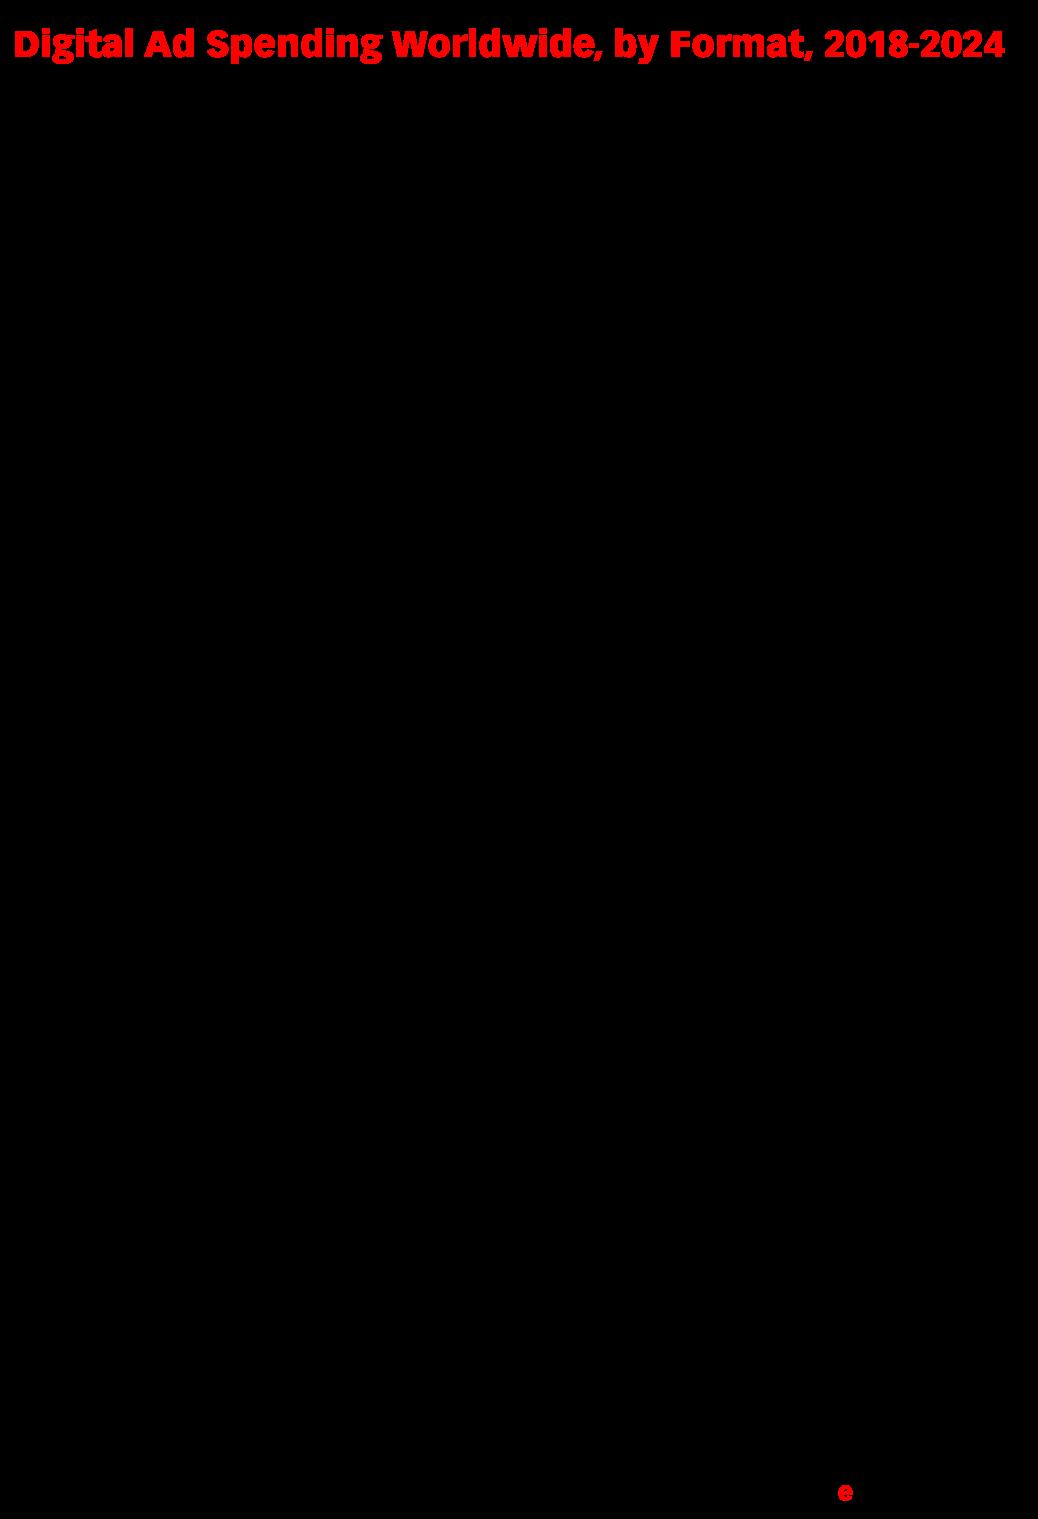 Digital Ad Spending Worldwide, by Format, 2018-2024